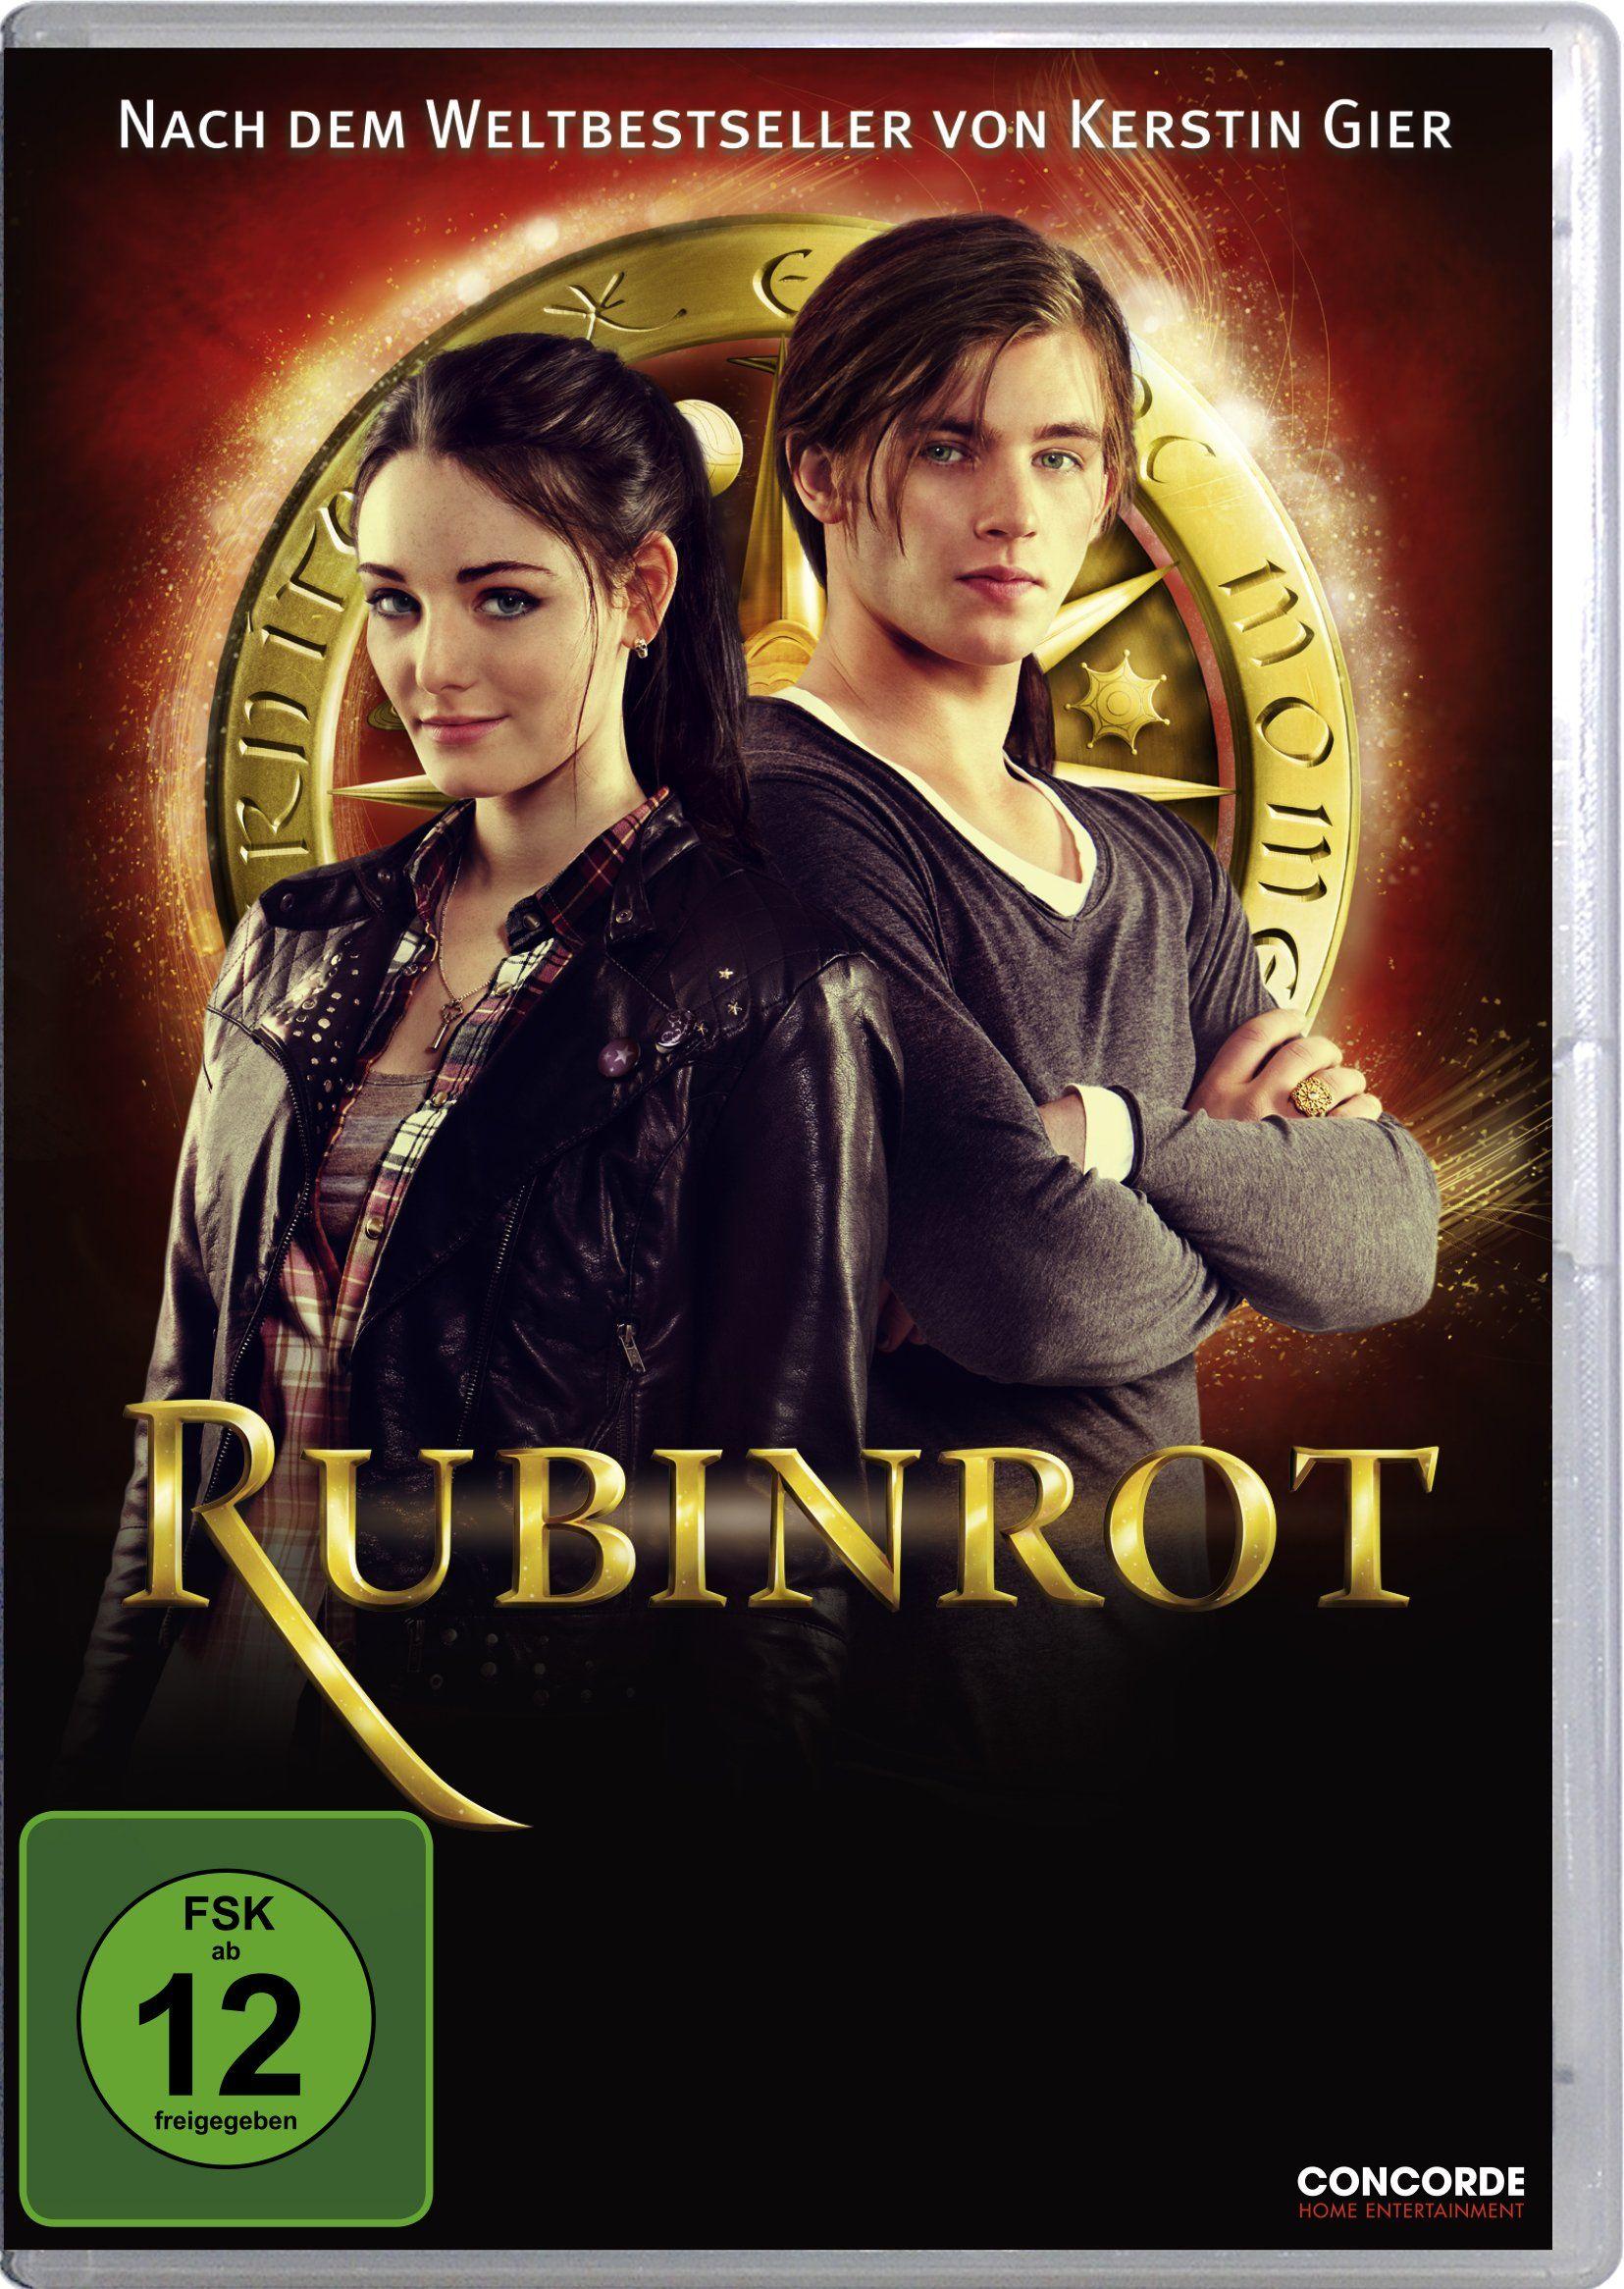 Rubinrot Dvd Rouge Rubis Rubis Rouge Rubis Film